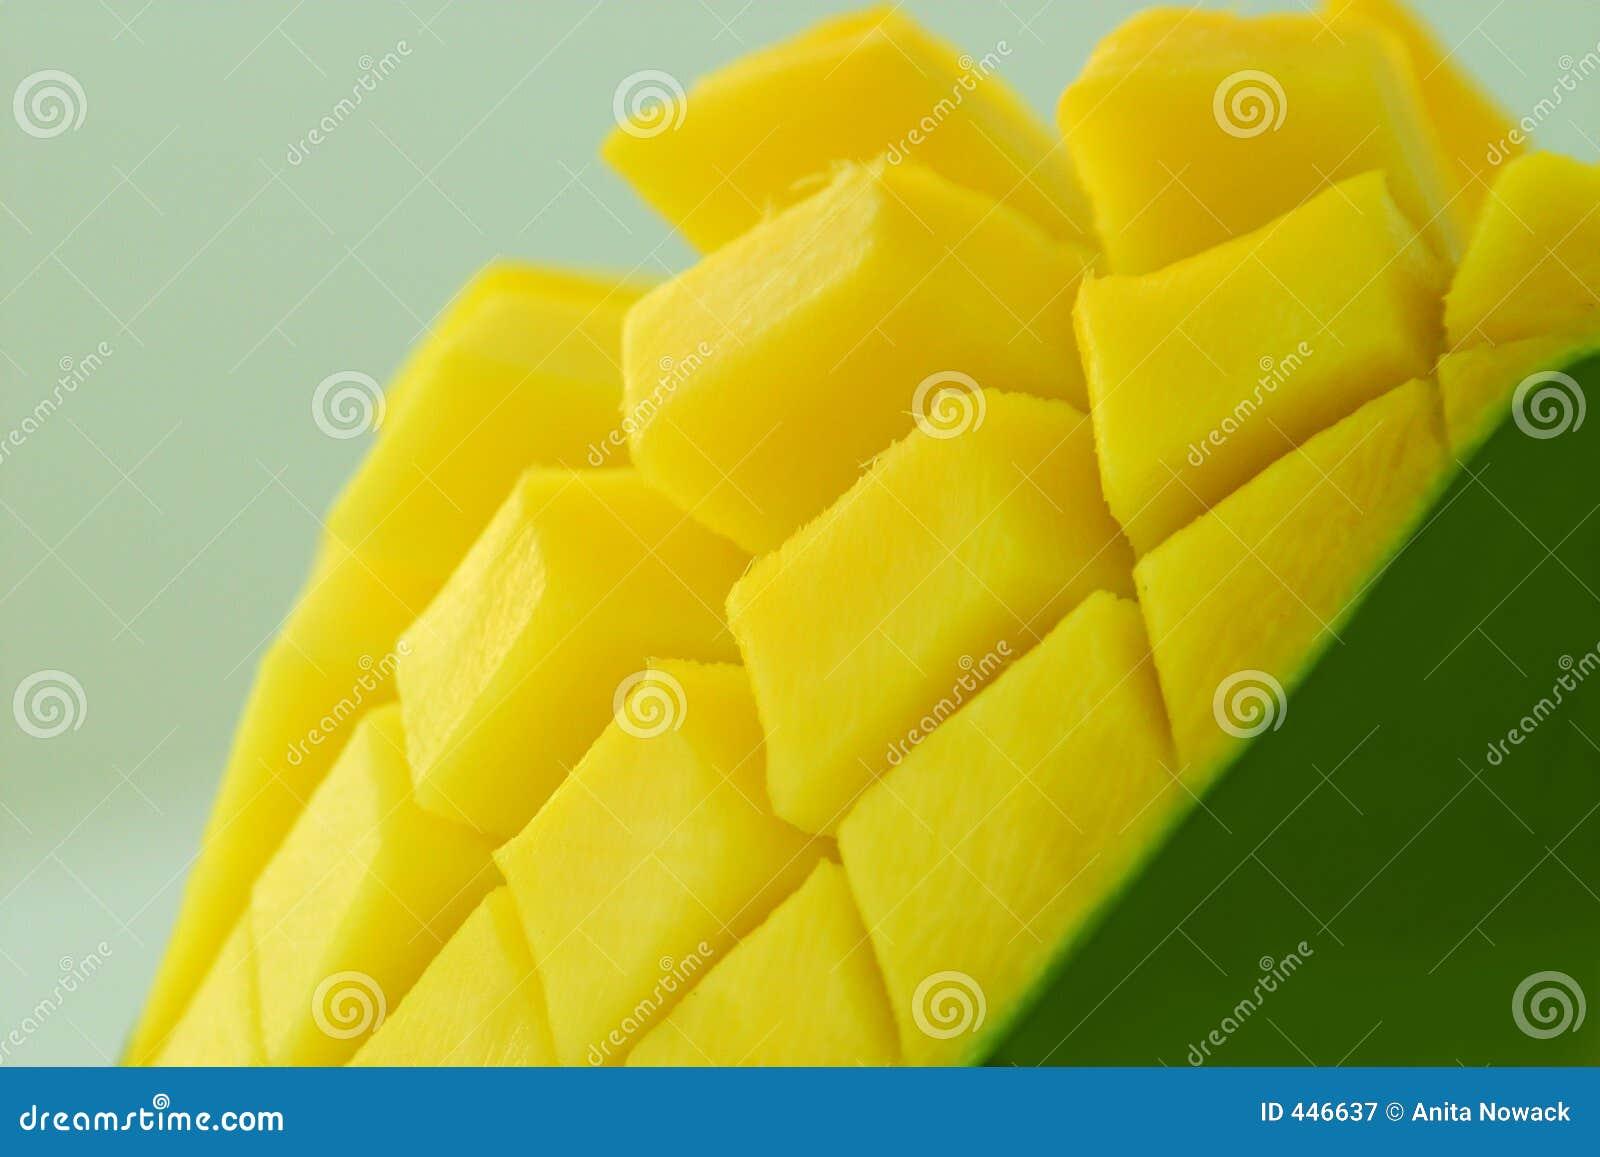 Exotic yellow mango